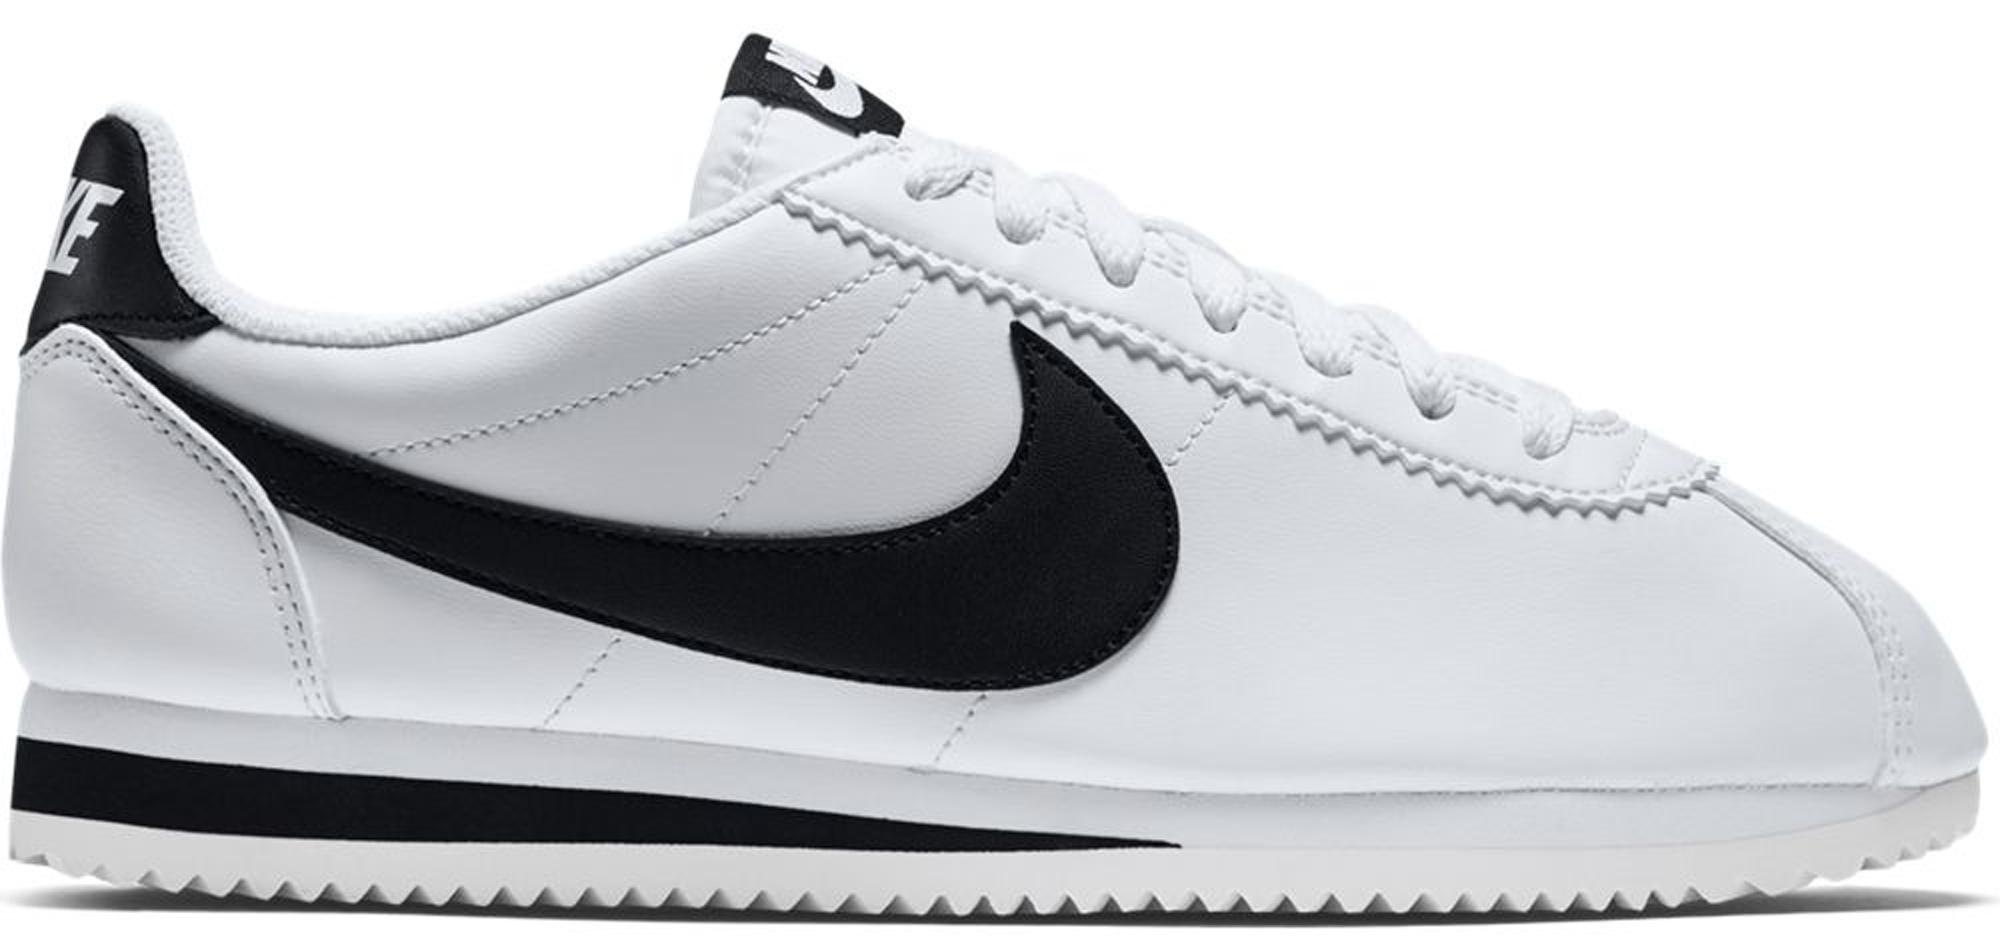 Nike Classic Cortez White Black (W